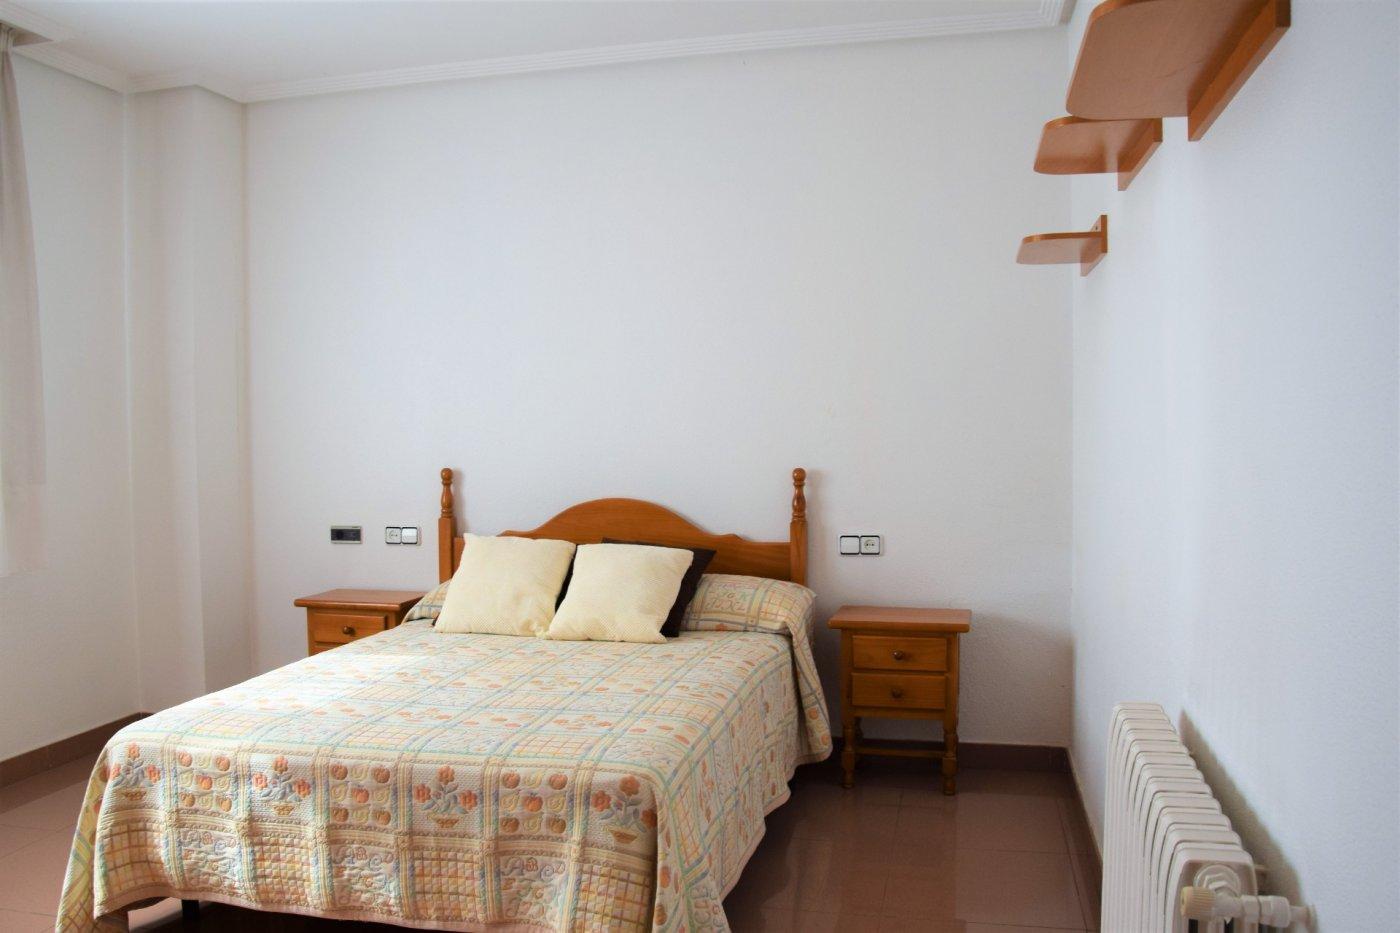 Chalet en Murcia www.joaquincarceles.com JC174 (22)